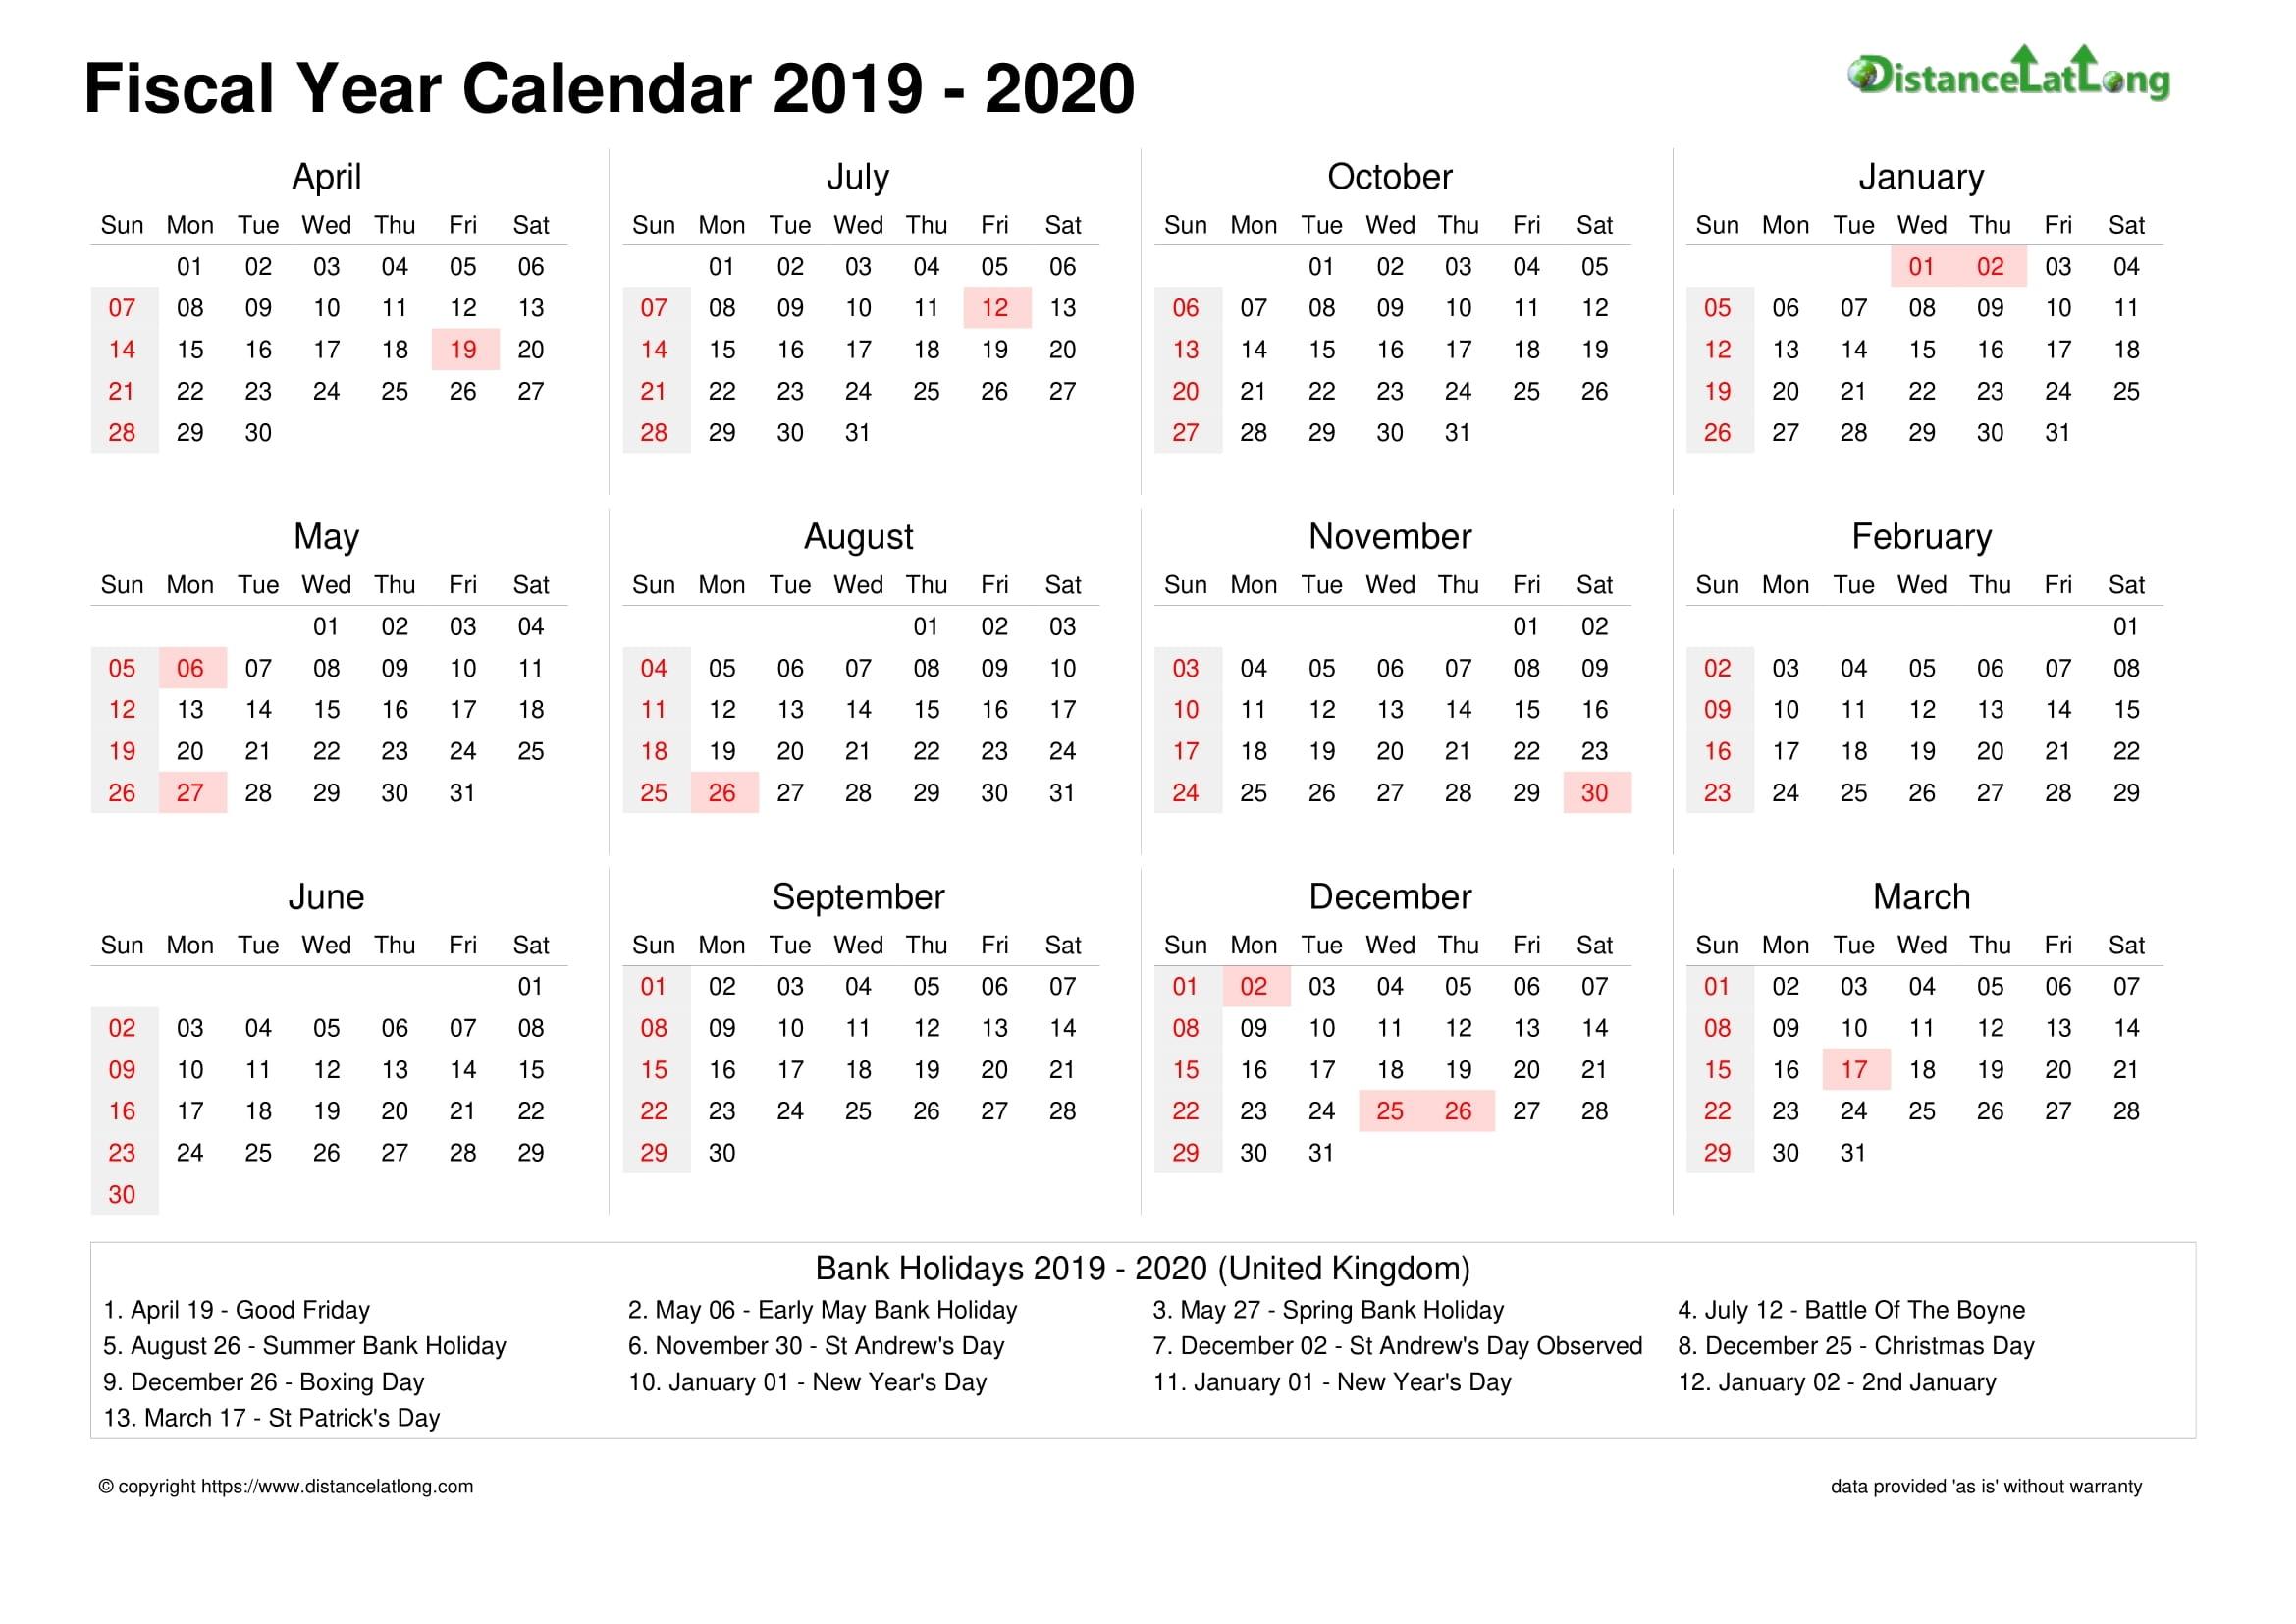 Fiscal Year 2019-2020 Calendar Templates, Free Printable inside Financial Calendar 2019/2020 Week Number 25